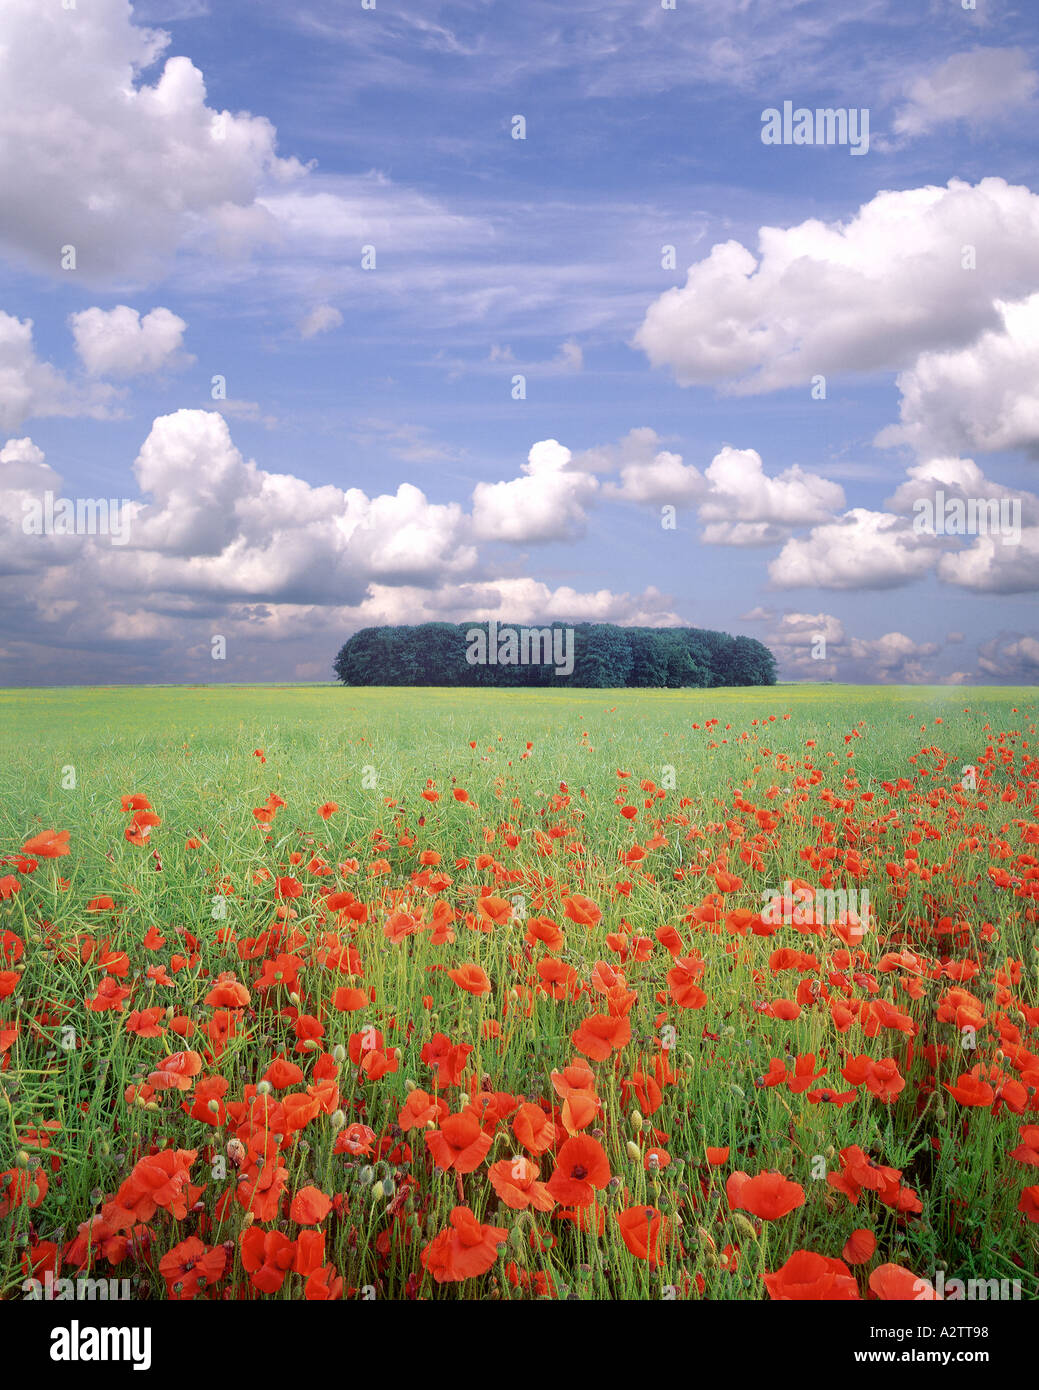 GB - GLOUCESTERSHIRE: Poppyfield in den Cotswolds Stockbild